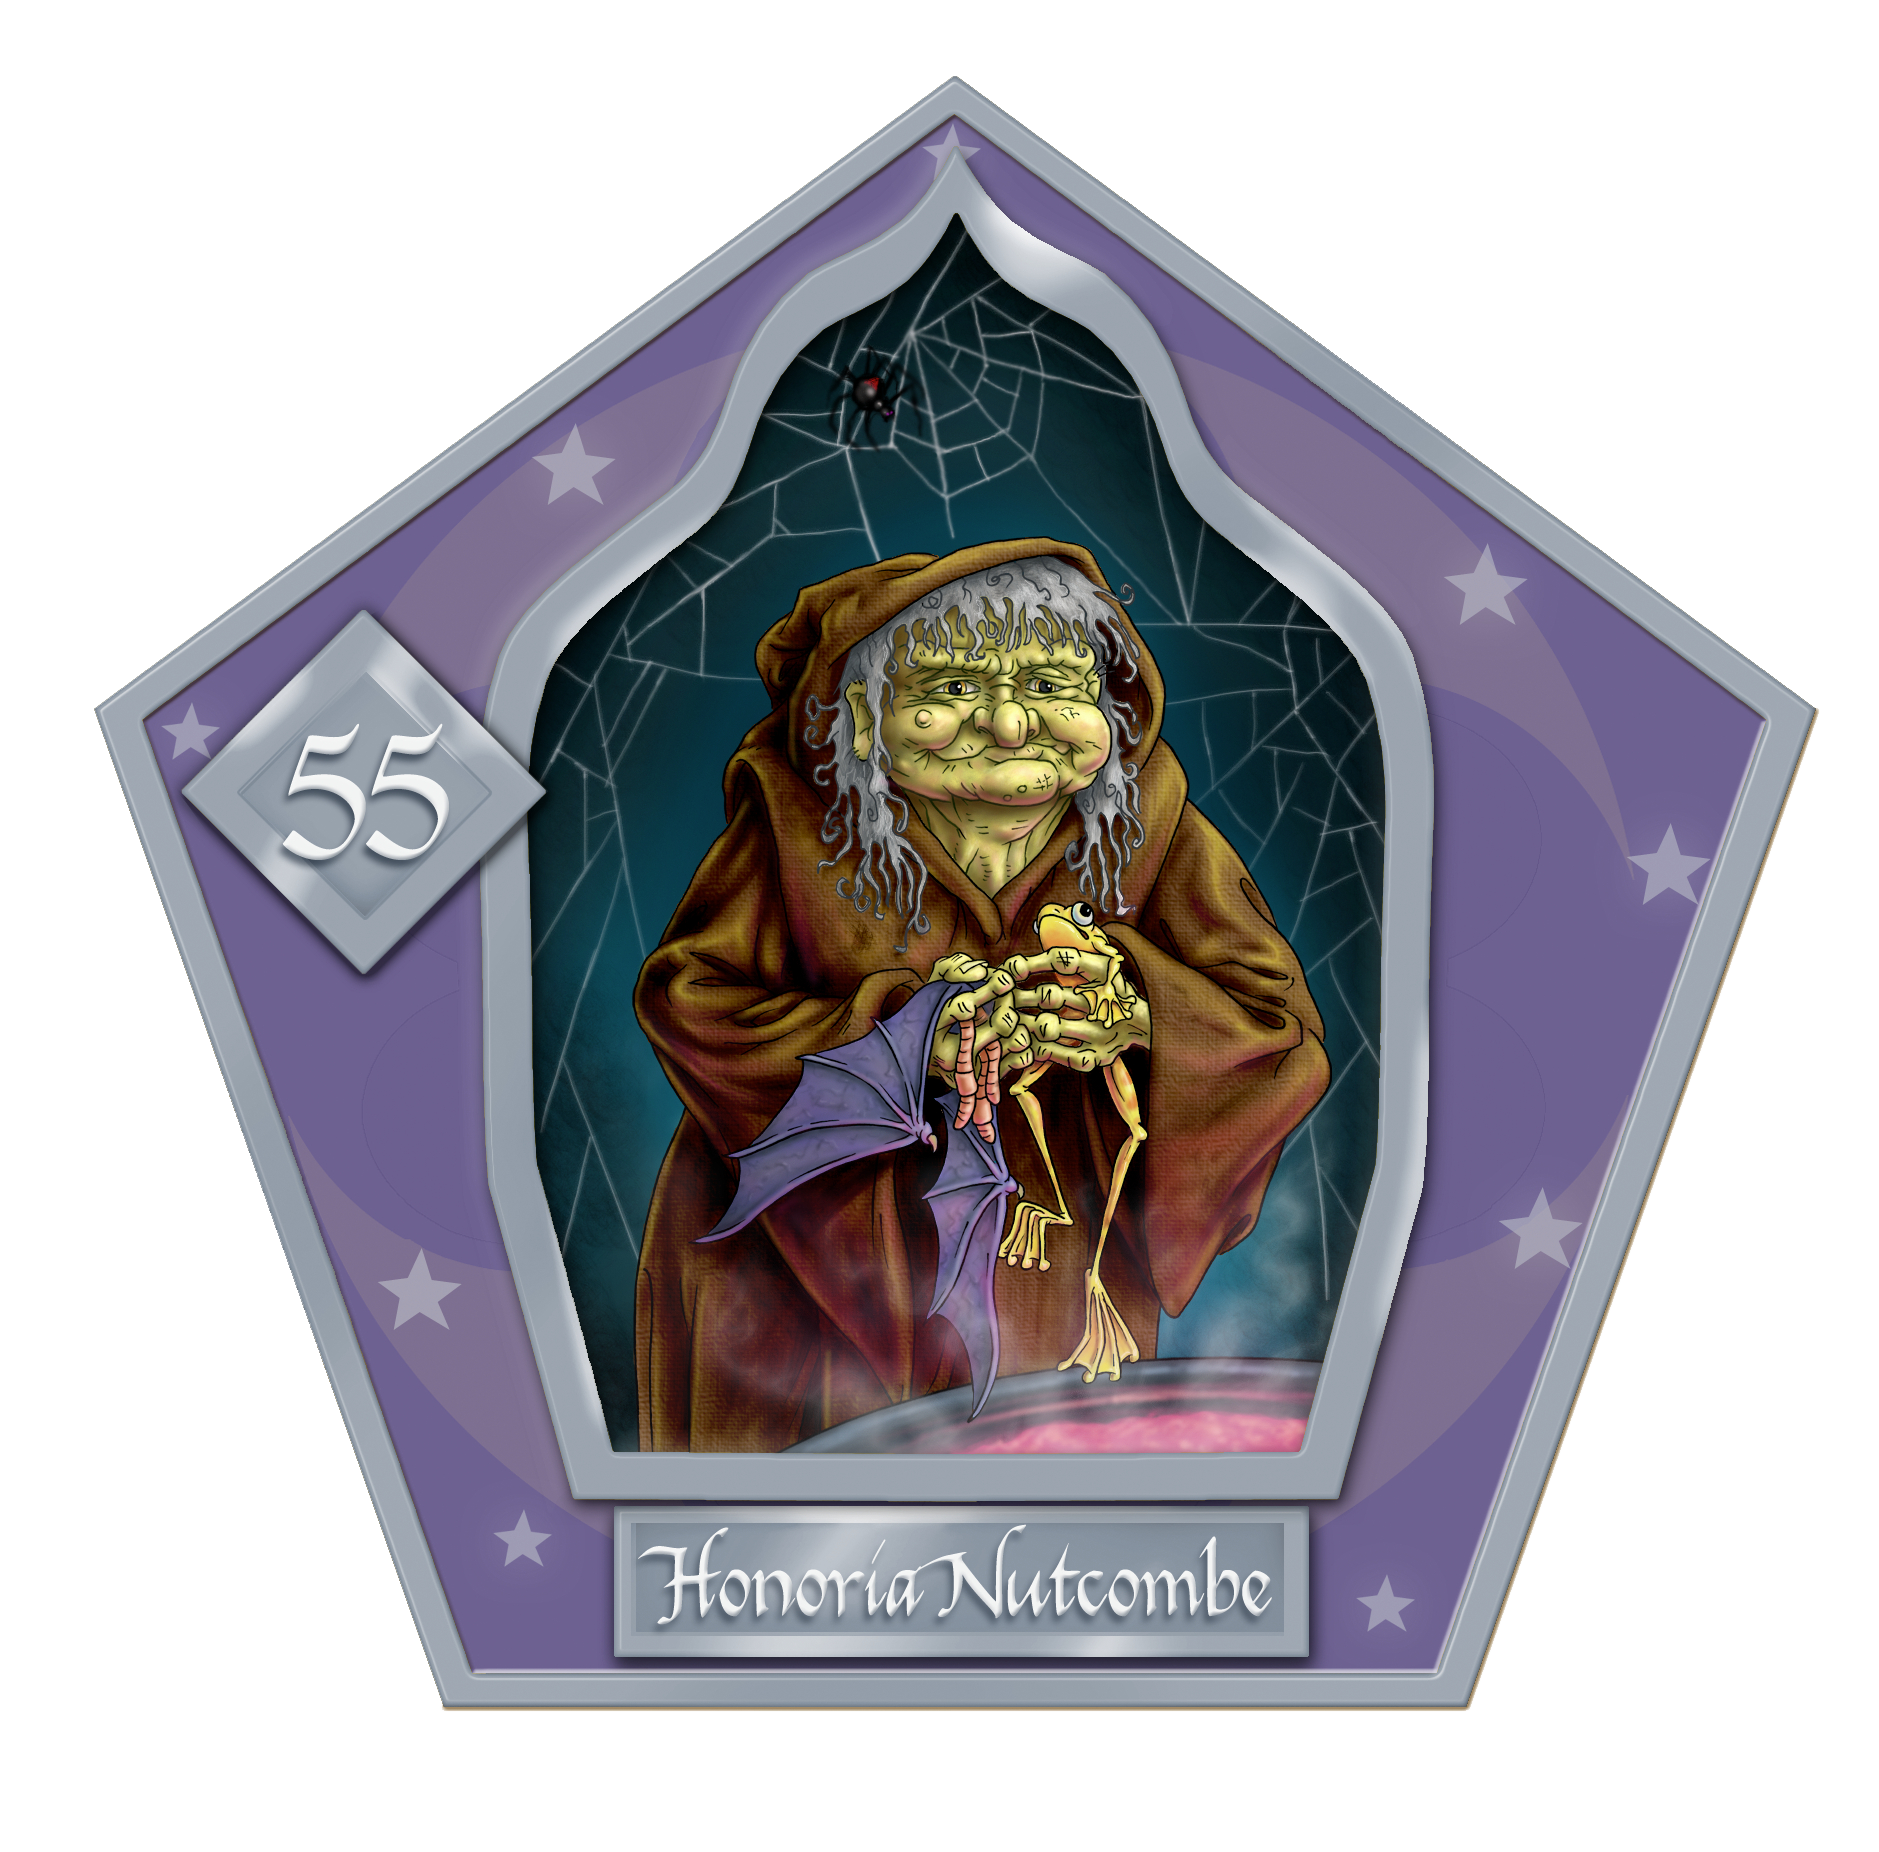 Honoria Nutcombe-55-chocFrogCard